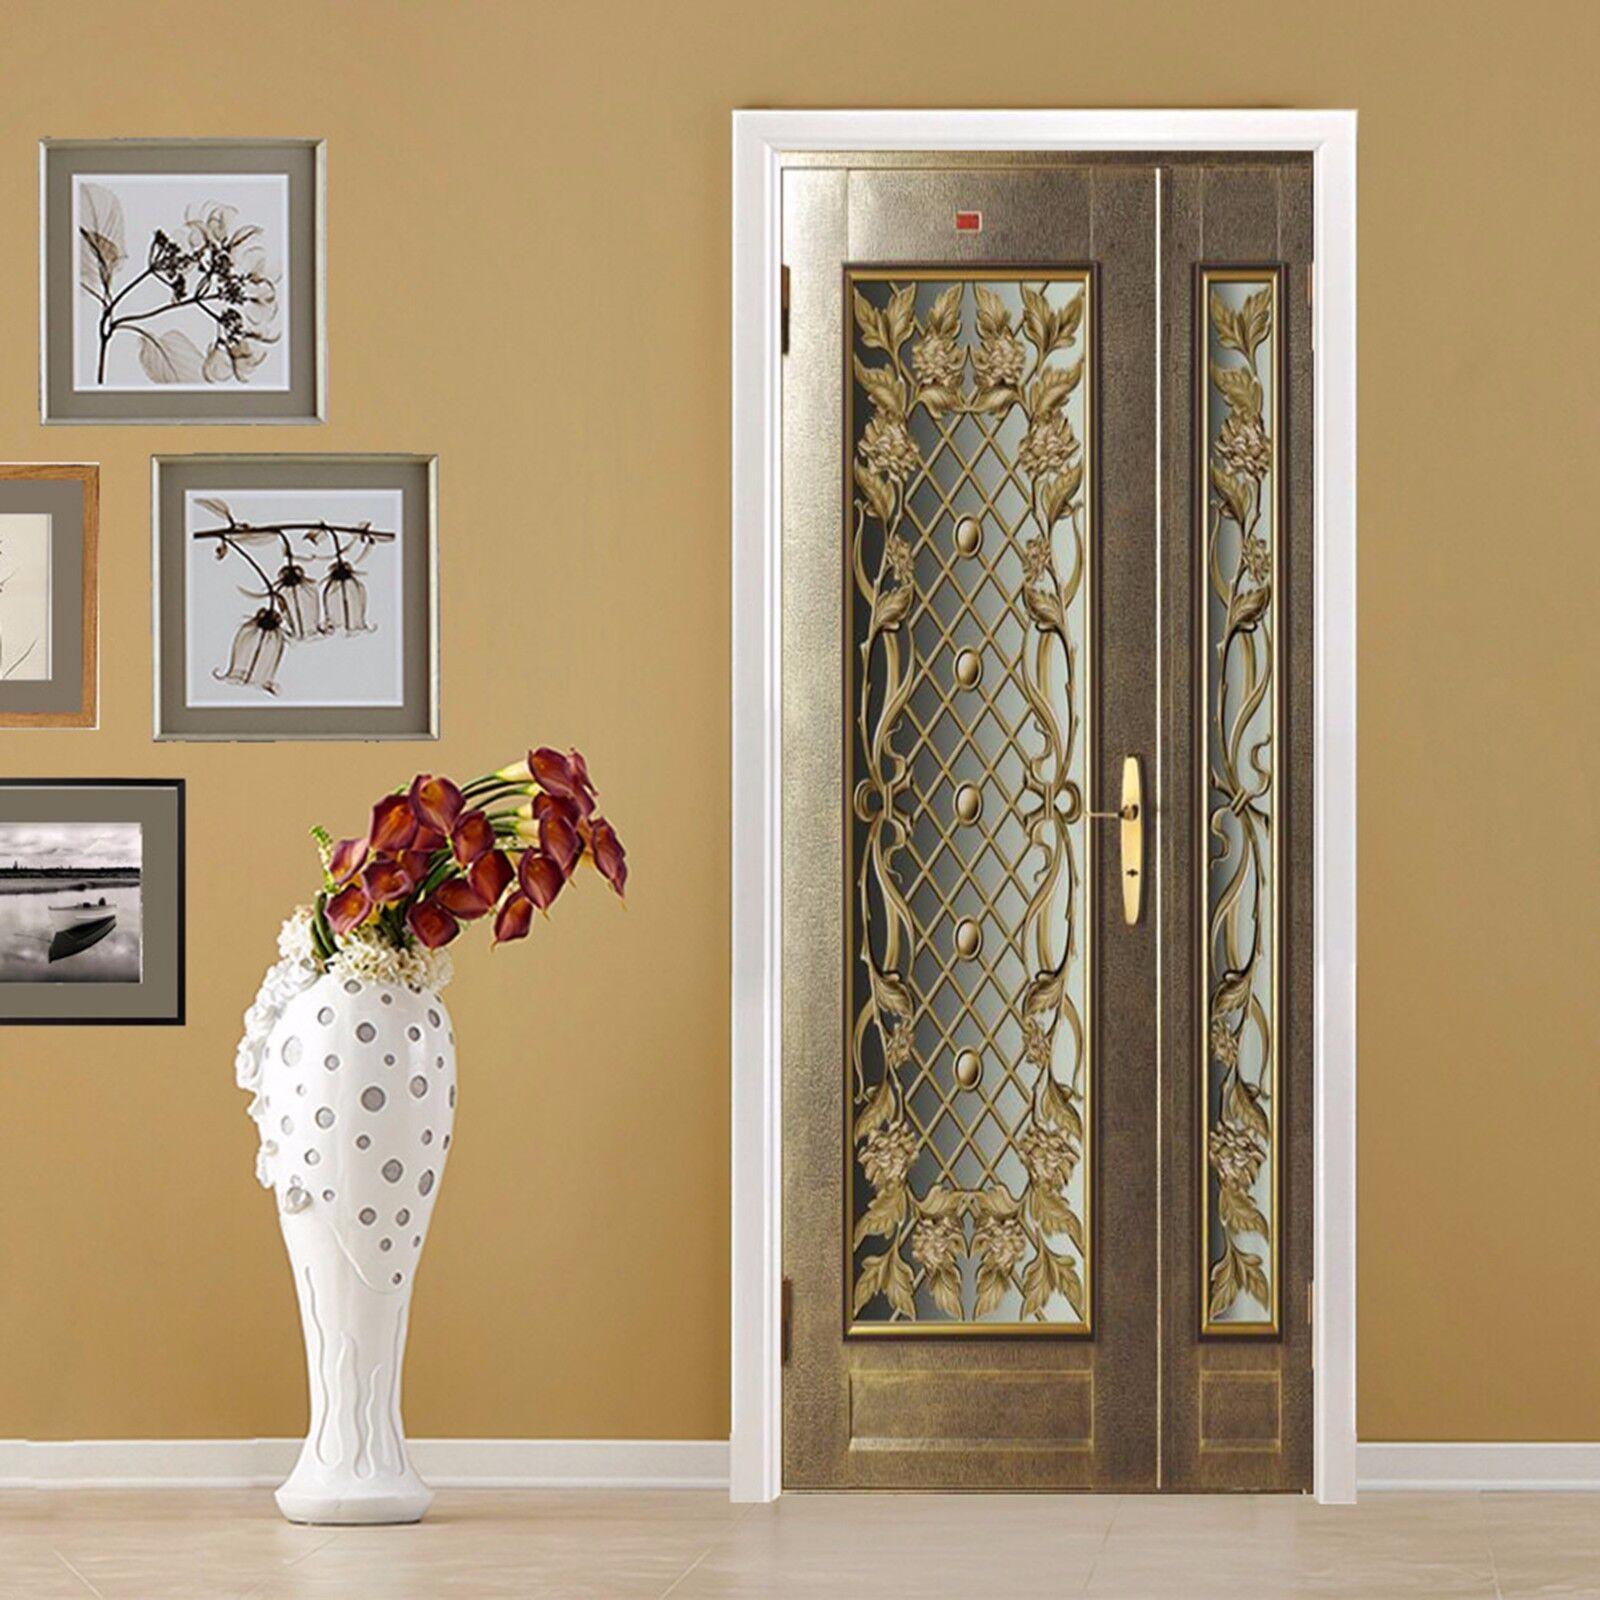 3D Muster 756 Tür Wandmalerei Wandaufkleber Aufkleber AJ WALLPAPER DE Kyra